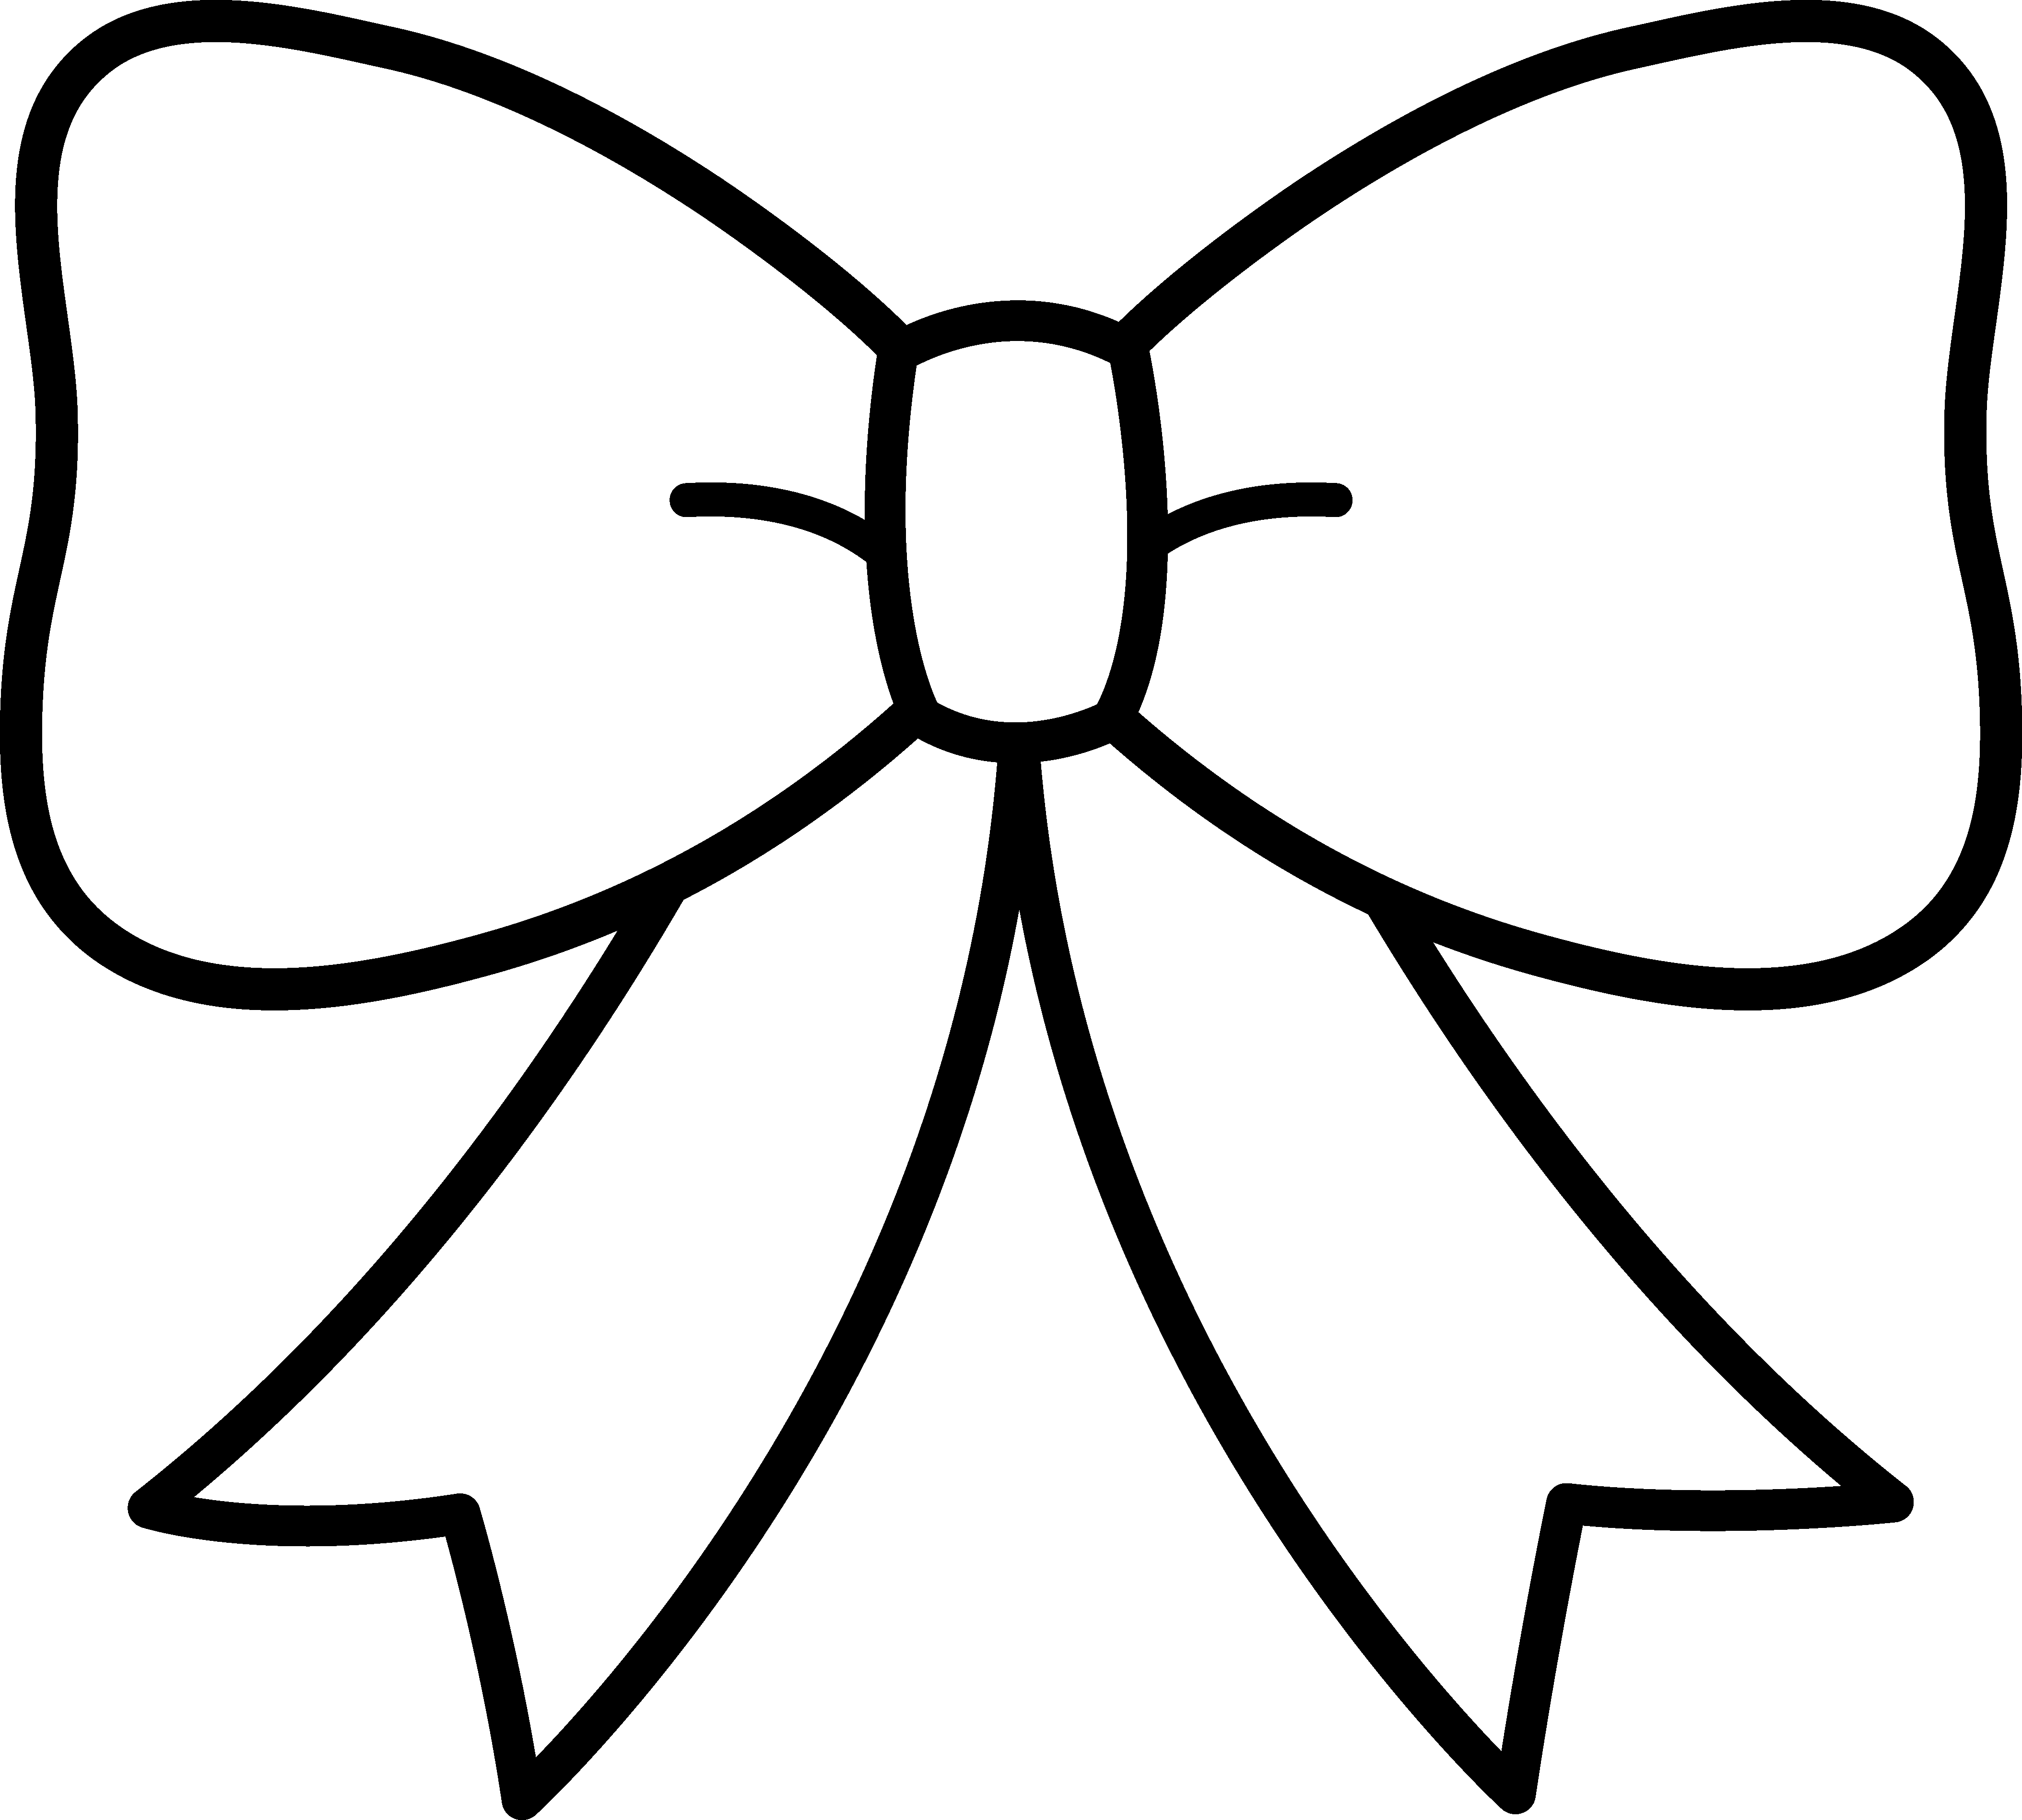 4216x3795 Black And White Bow Design